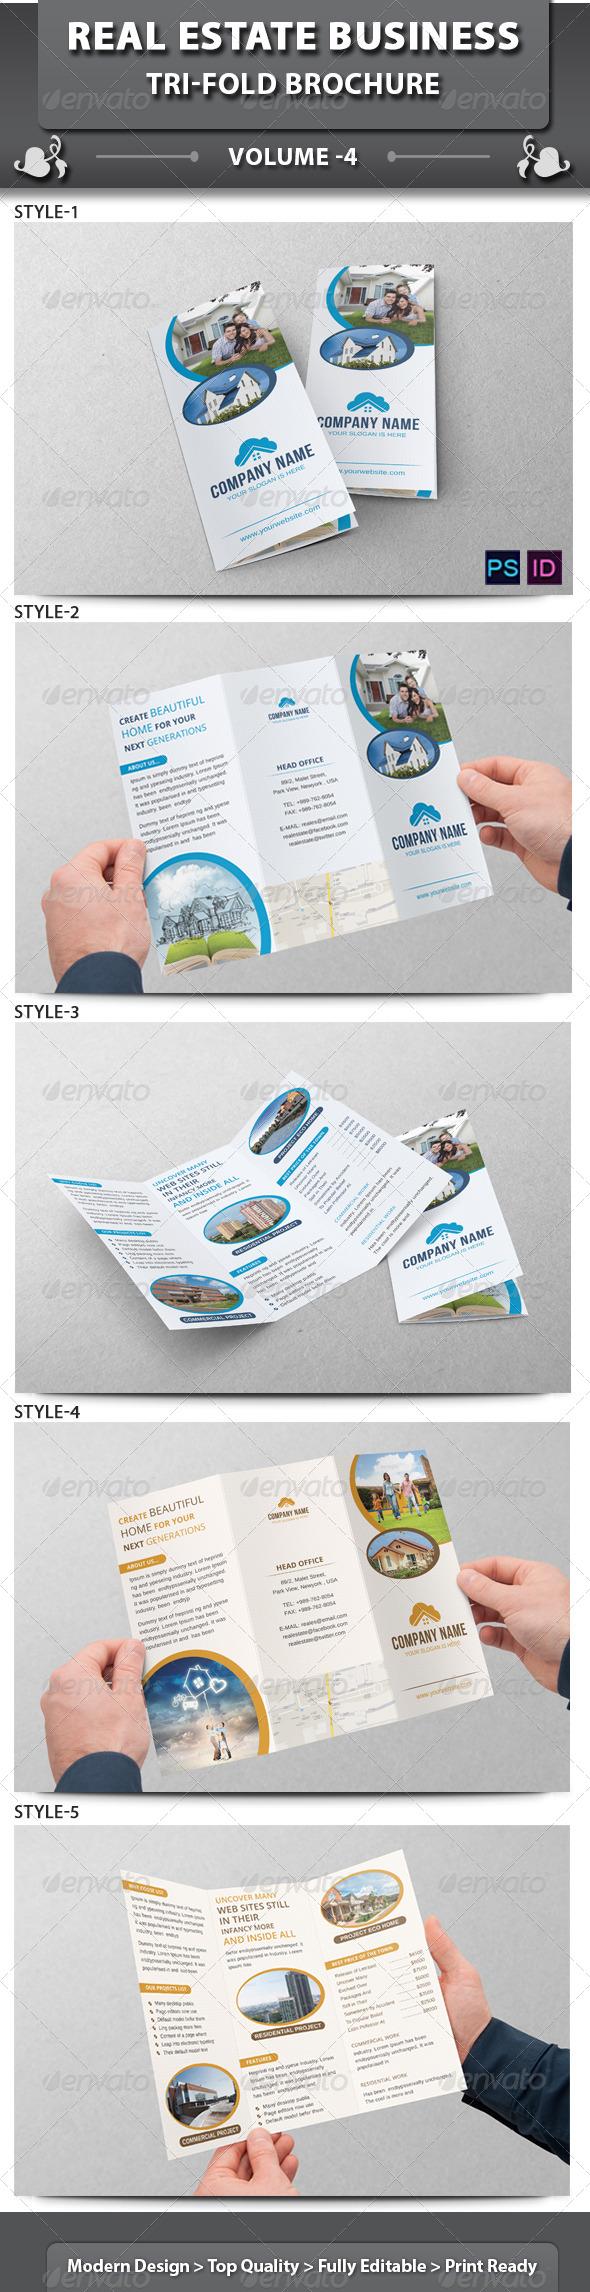 GraphicRiver Real Estate Business Tri-fold Brochure Volume 4 6574745